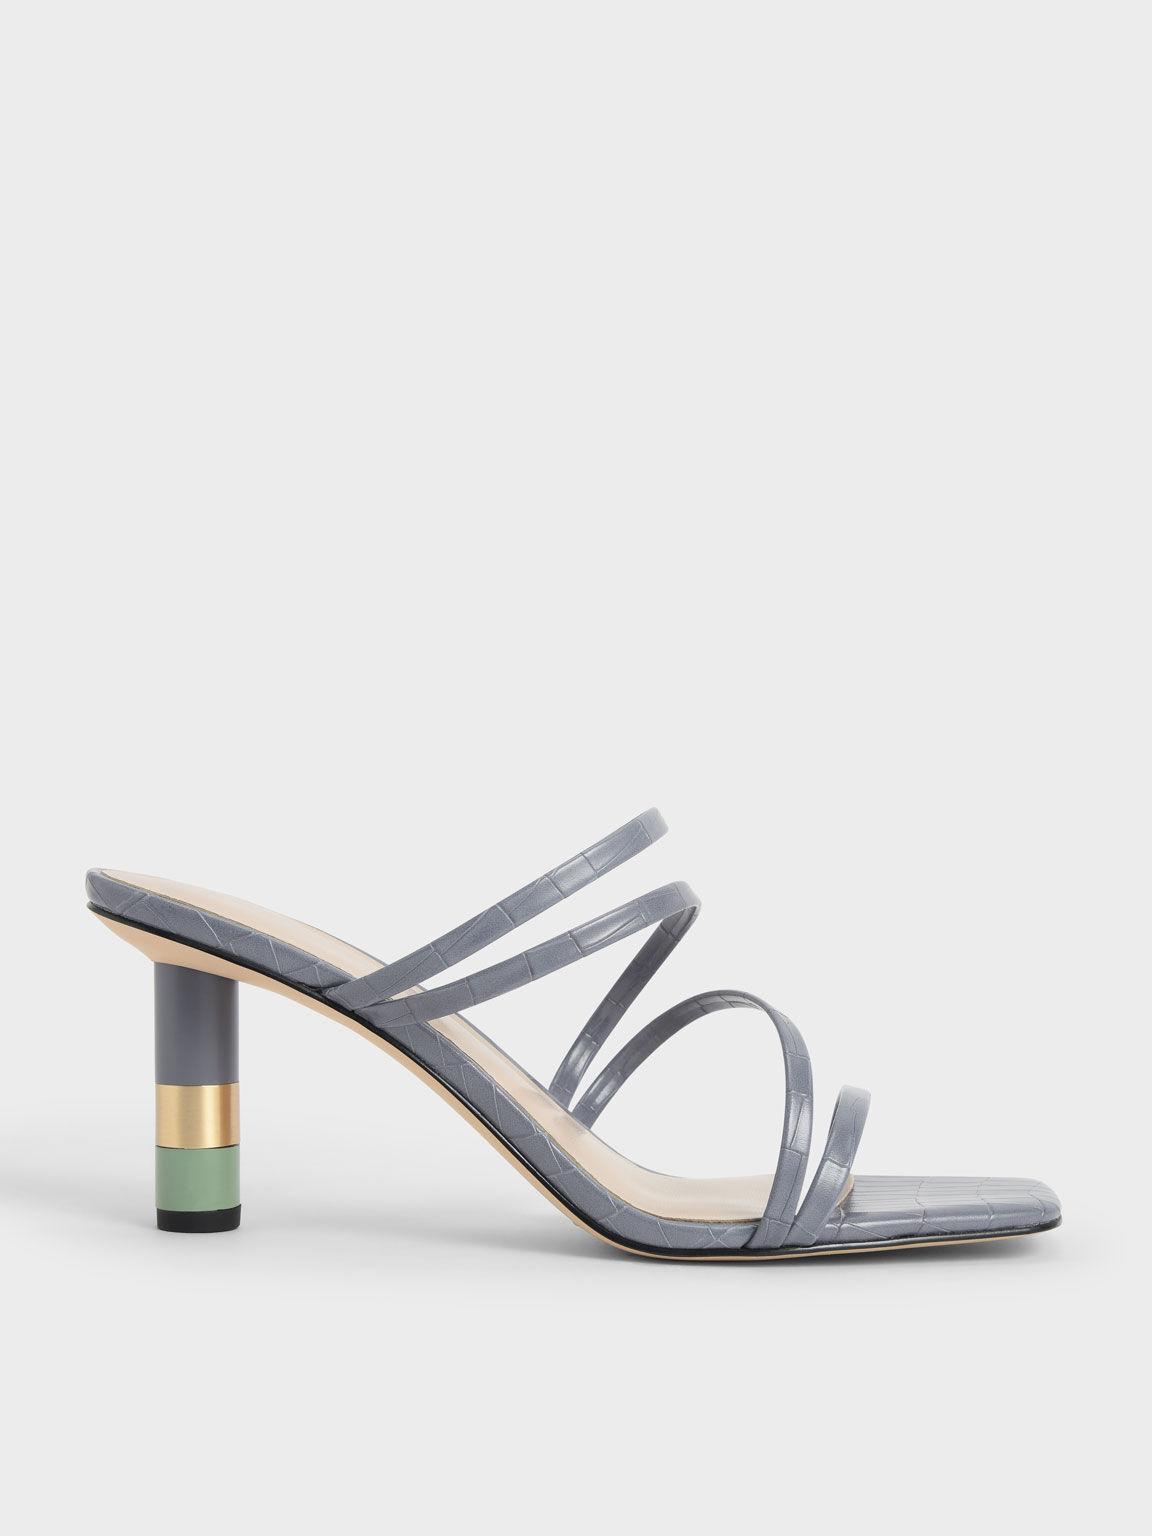 Croc-Effect Cylindrical Heel Mules, Animal Print Blue, hi-res